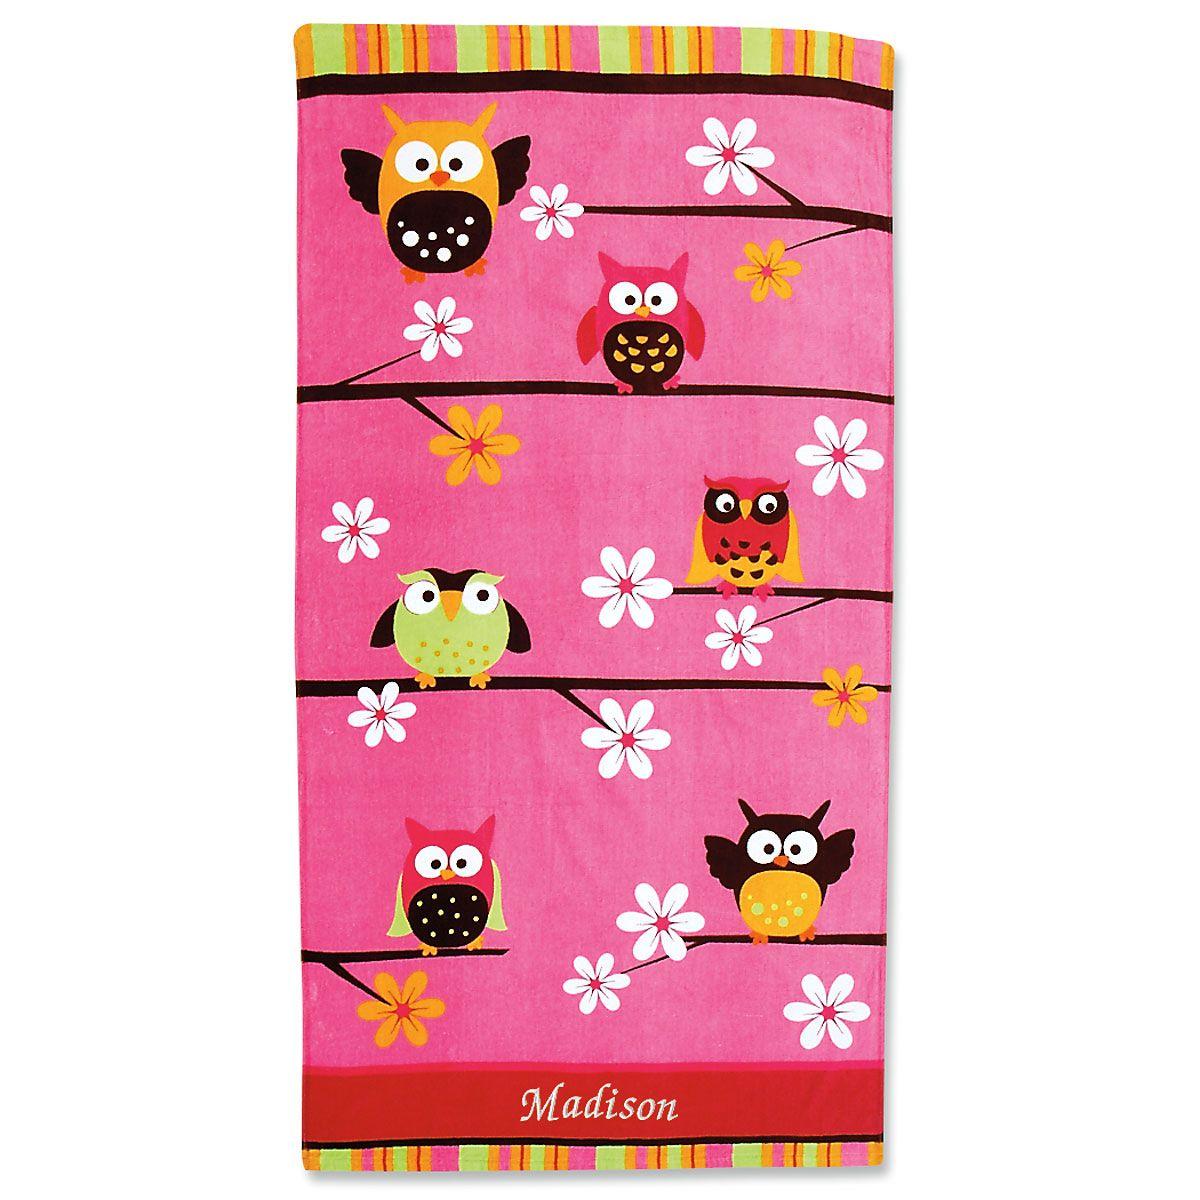 Personalized Owl Beach Towel